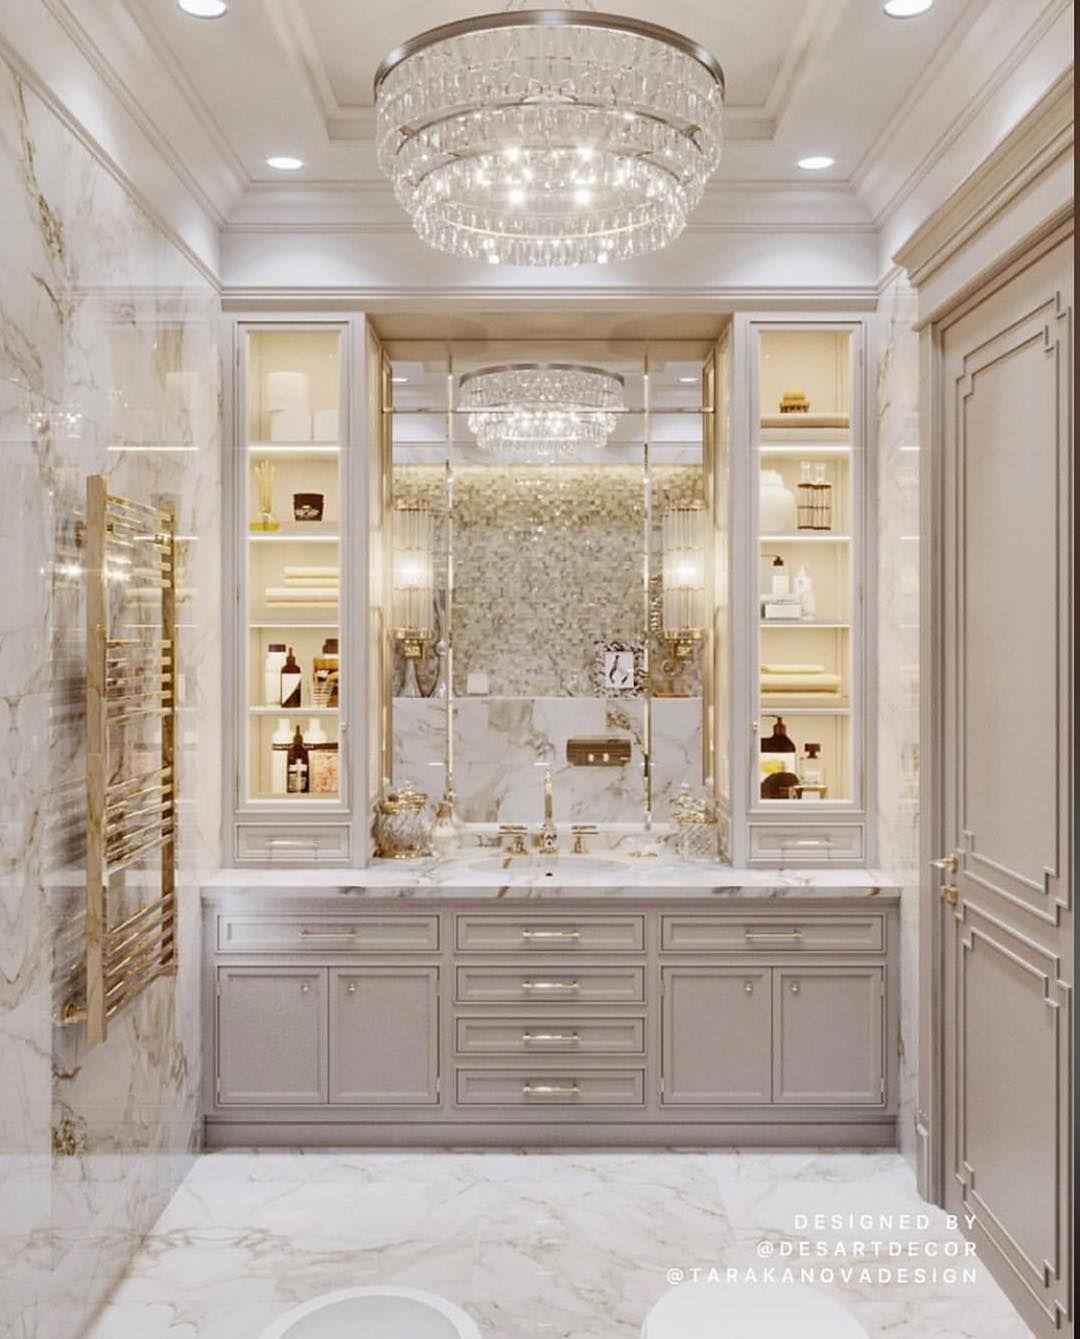 "Photo of Simply Unique Space auf Instagram: ""Was für eine luxuriöse, klassische Gästetoilette! Follow @simplyuniquespace – – – By @desartdecor #simplyuniquespace #bathroomdesign"""